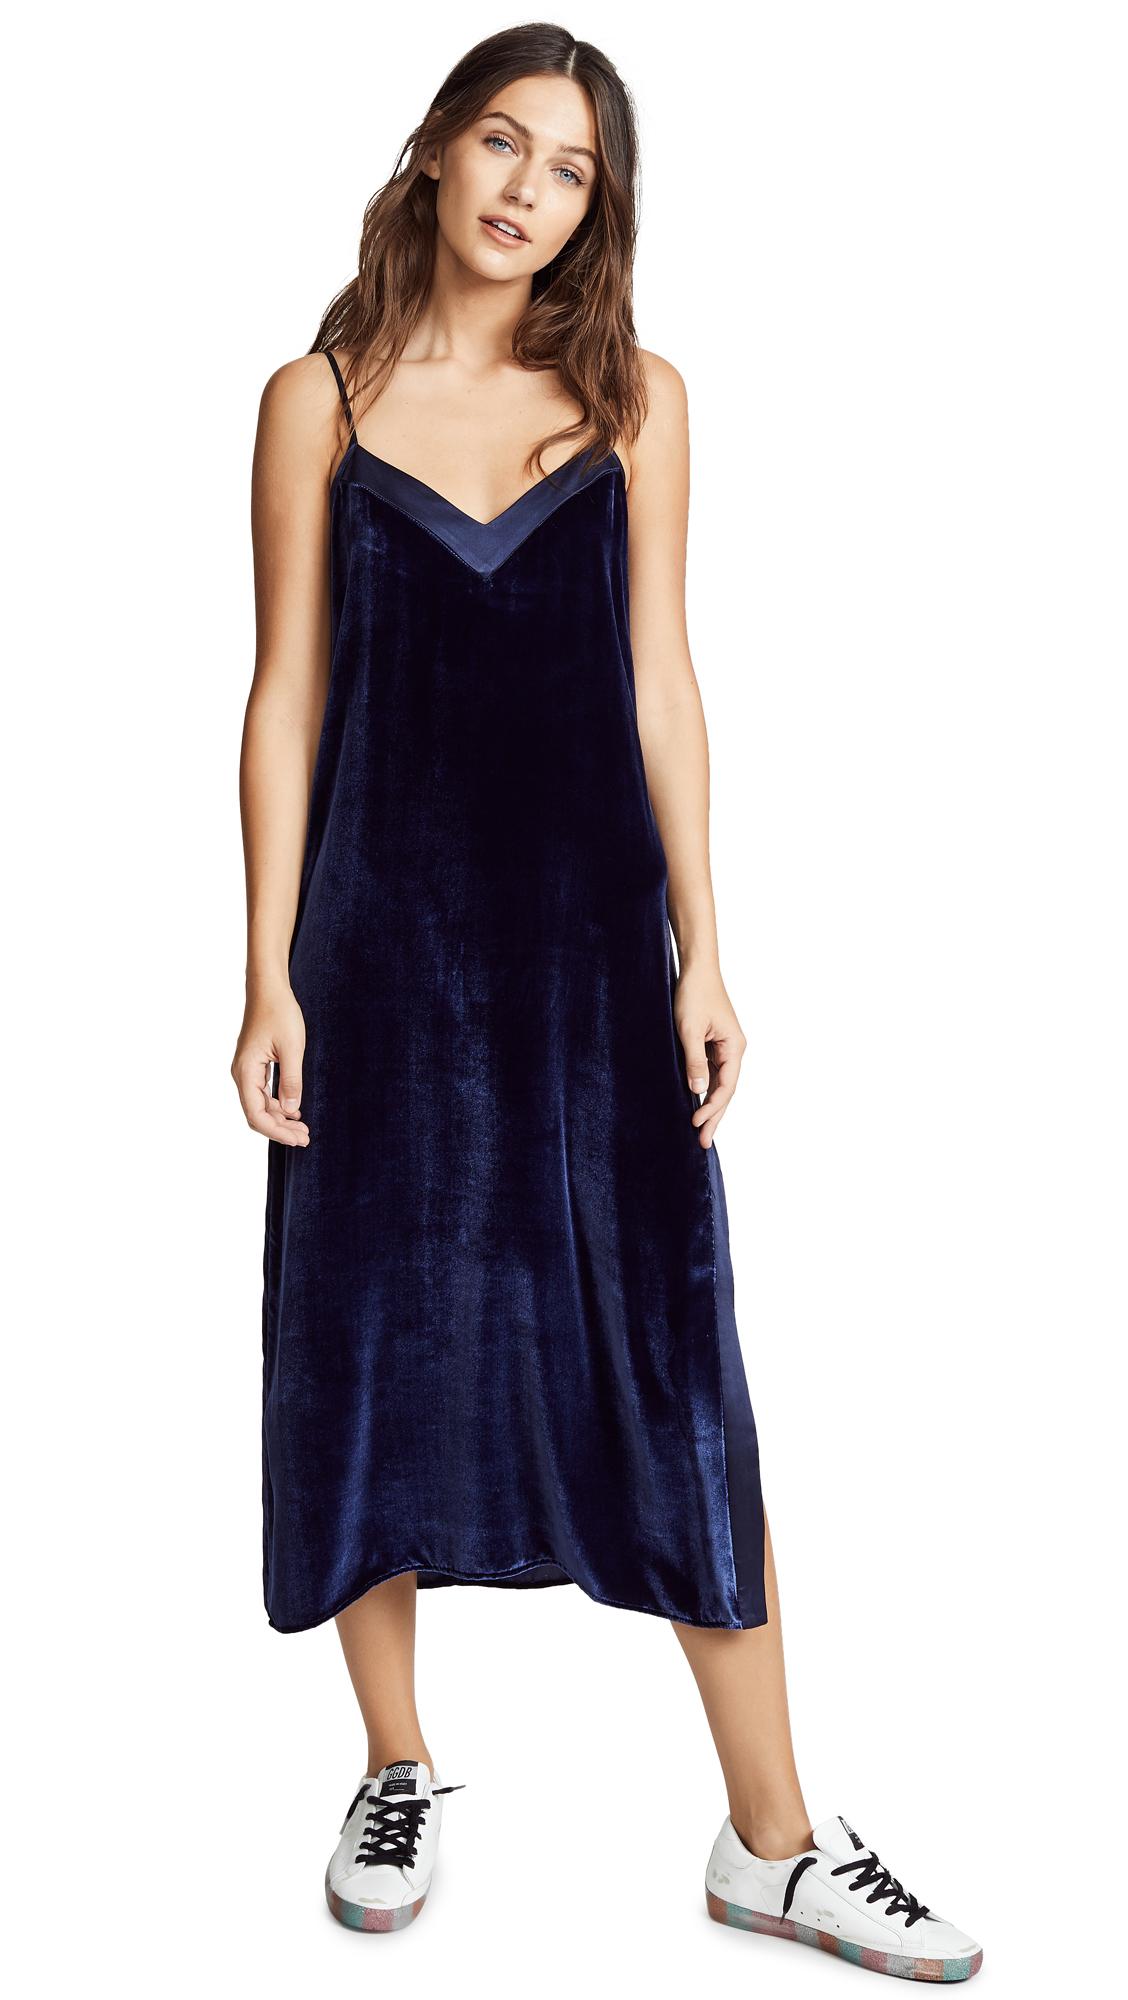 ei8htdreams Silk Contrast Velvet Midi Dress In Navy